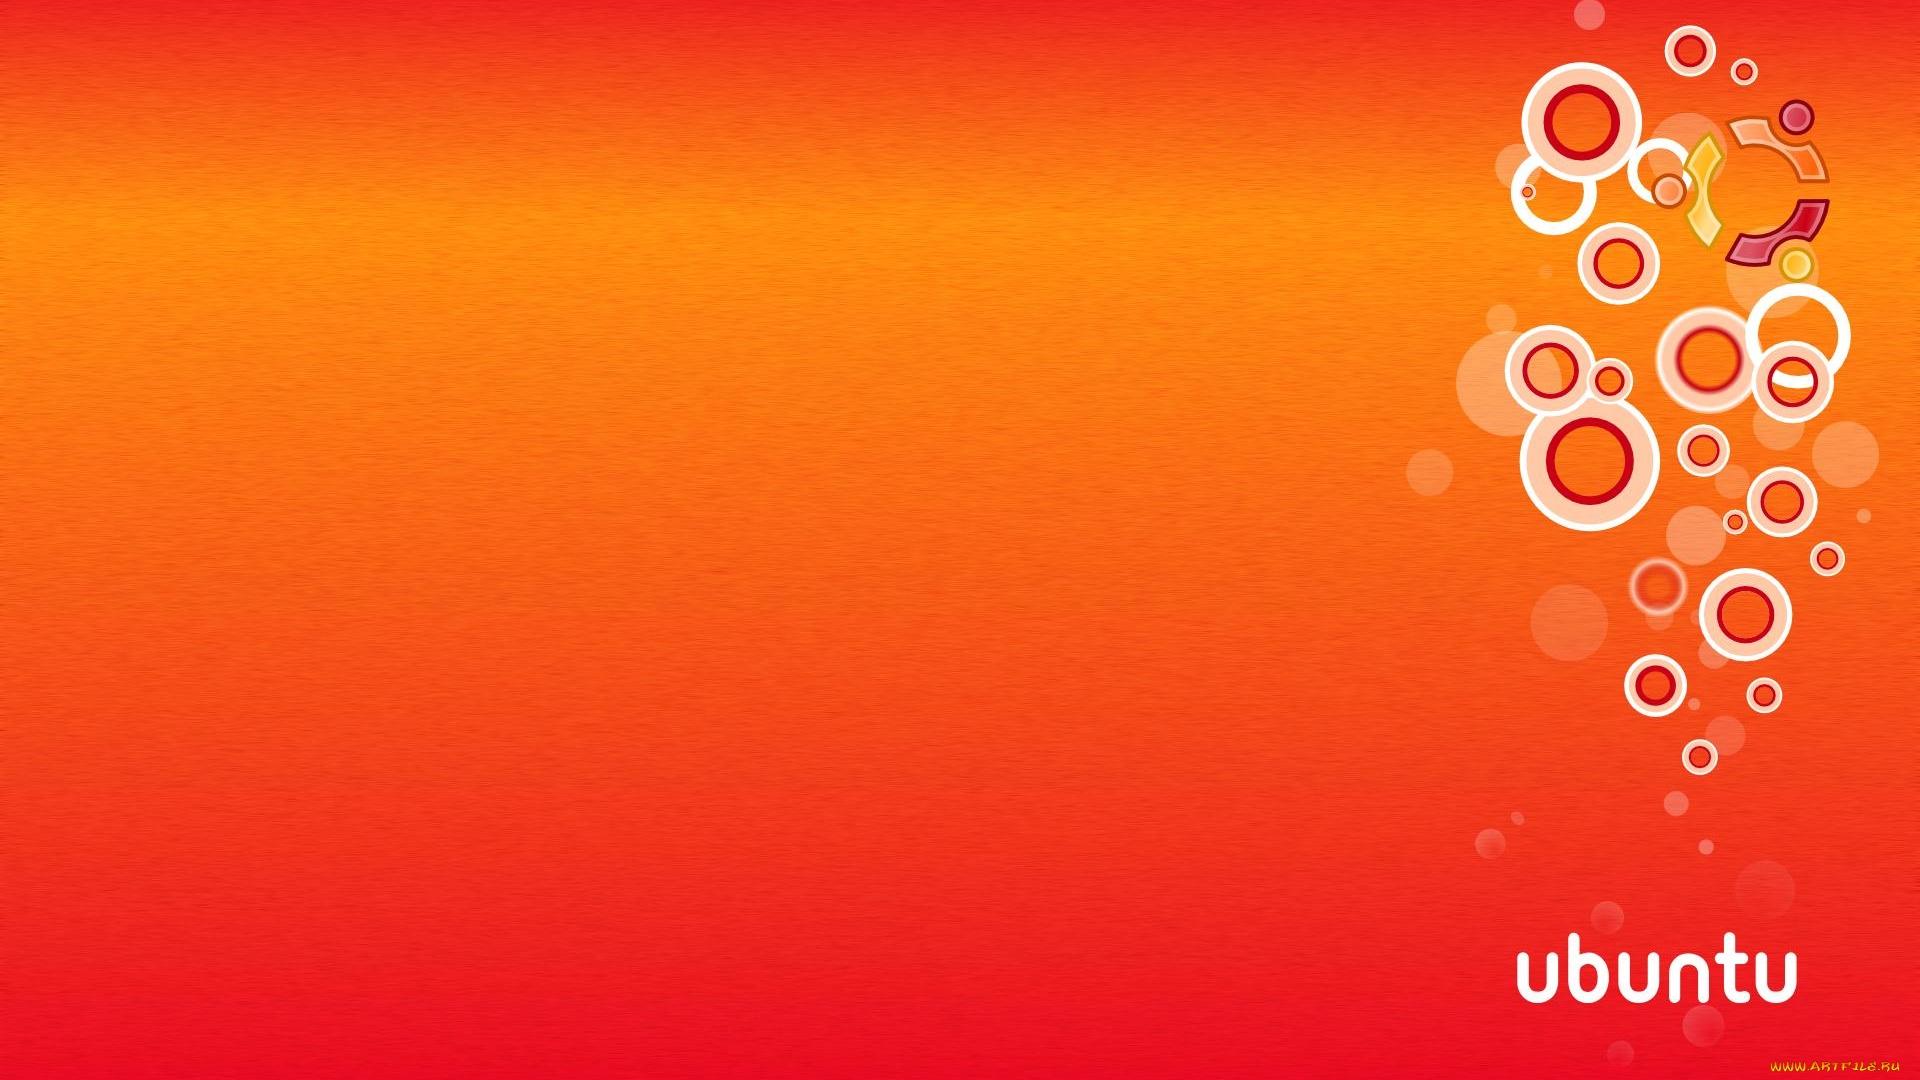 Ubuntu Wallpaper Image